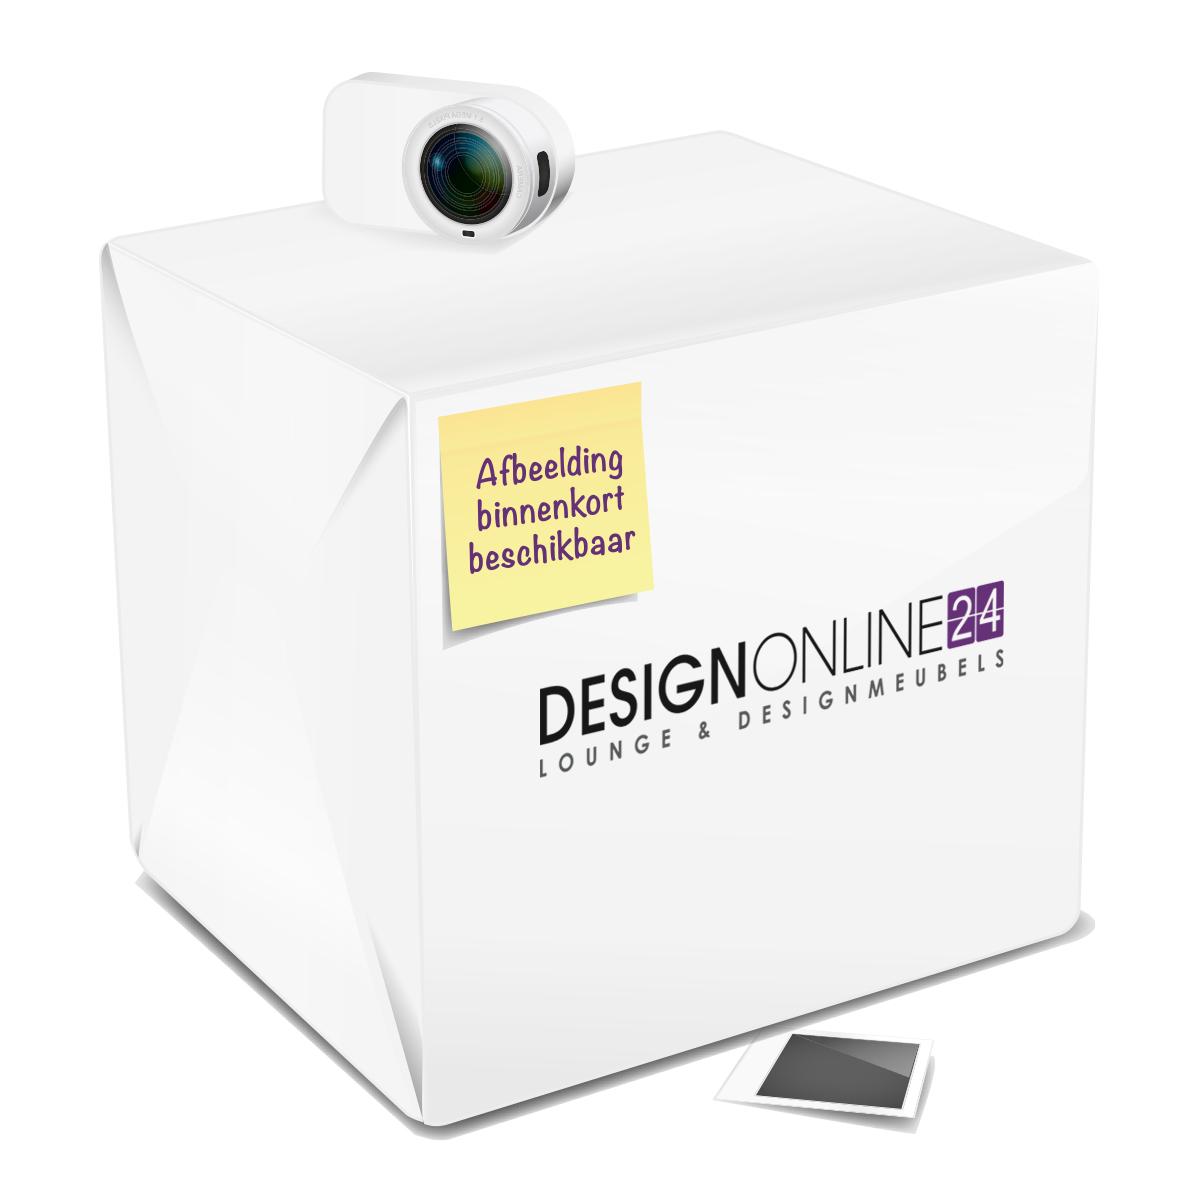 Vloerkleed Mono Licht Roze  100% Katoen  DesignOnline24